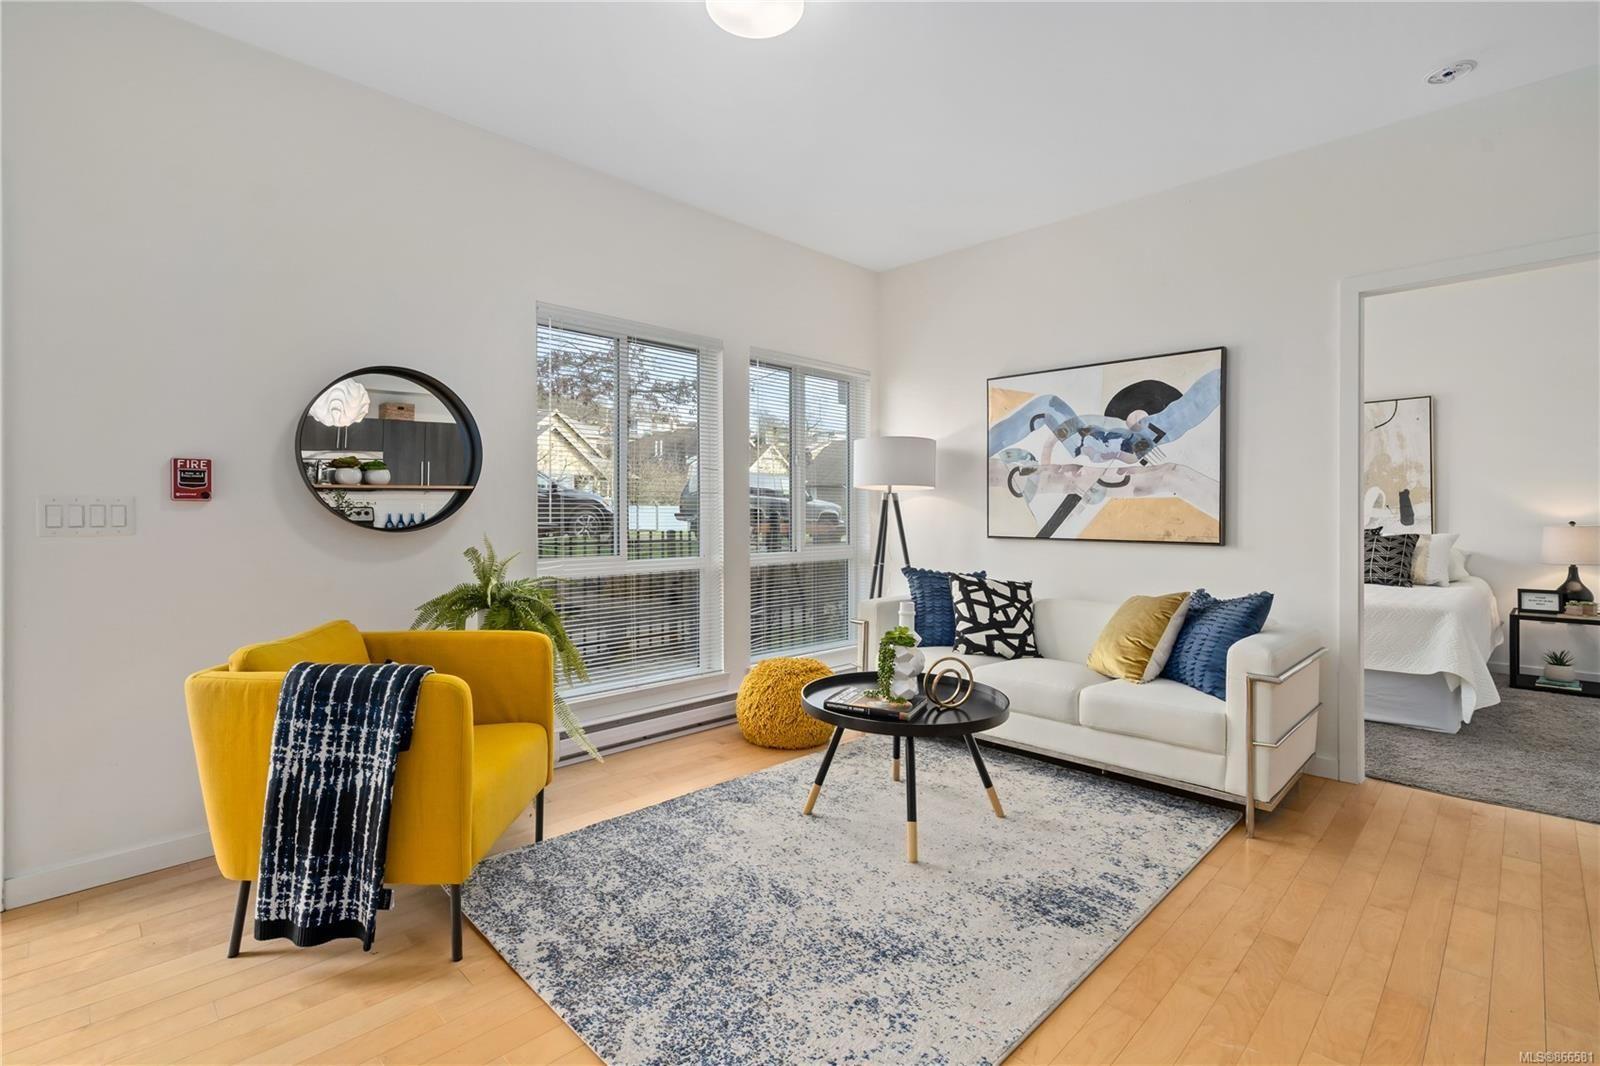 Main Photo: 104 4050 Douglas St in : SE Swan Lake Condo for sale (Saanich East)  : MLS®# 866581